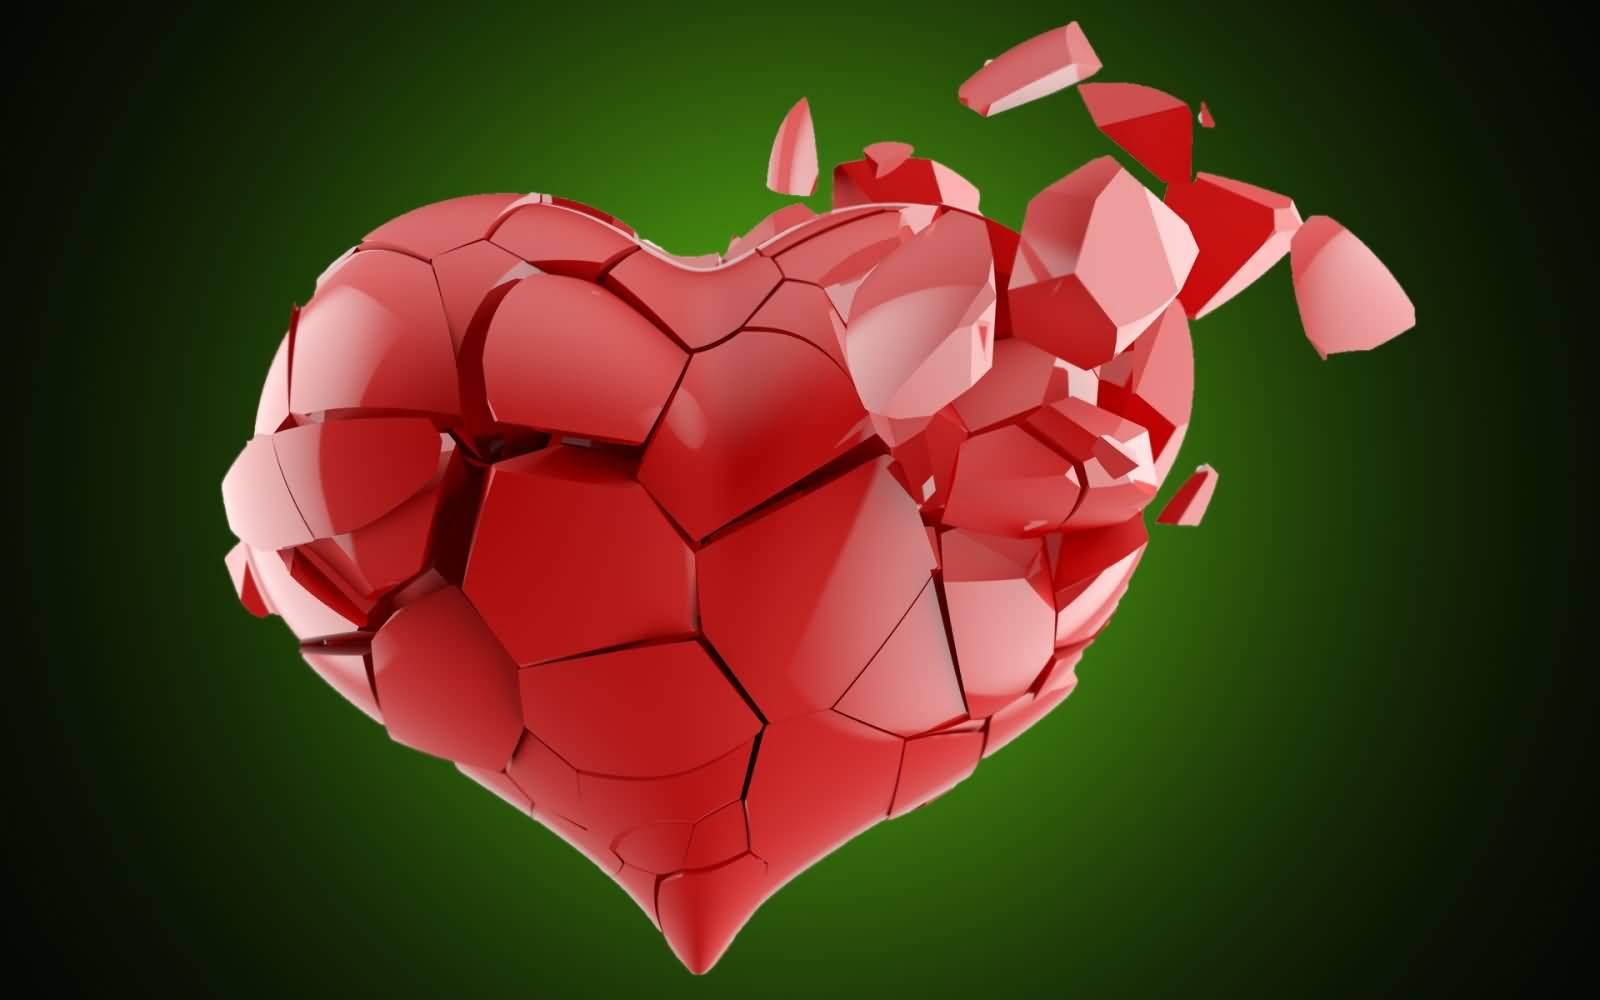 Red Crystals Broken Heart Design